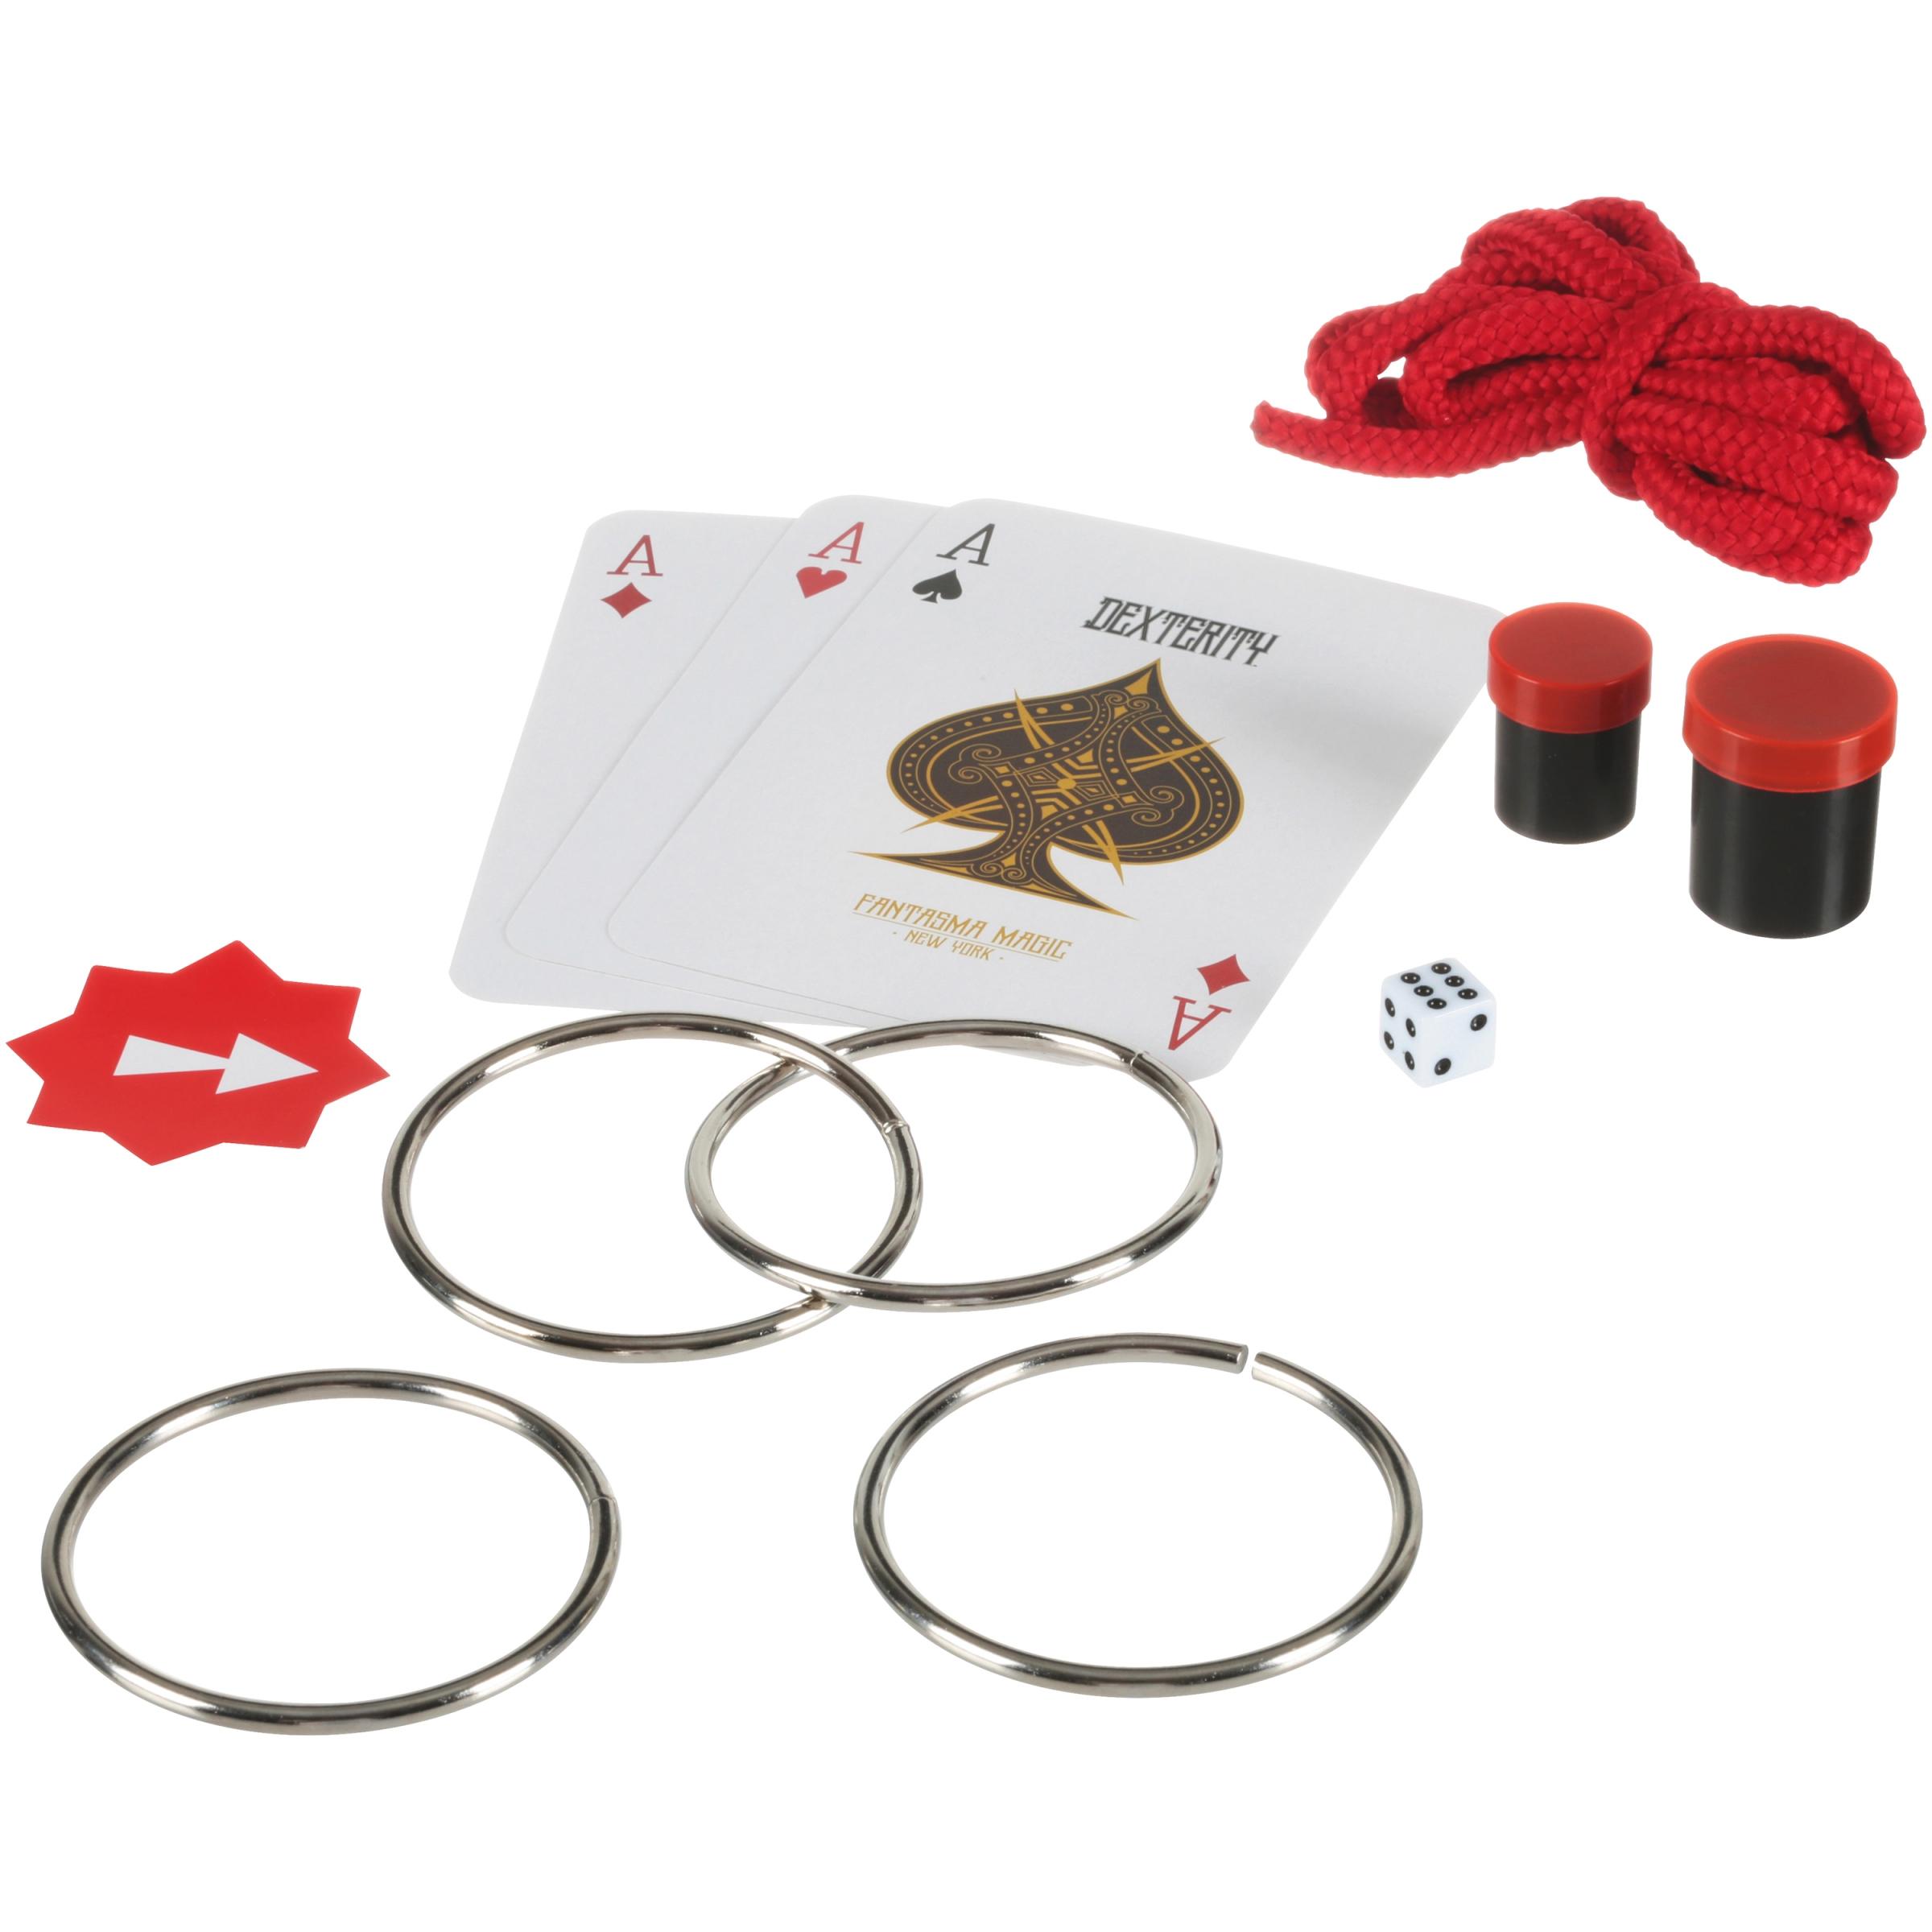 Fantasma Magic® Classic Magic Kit 11 pc Box